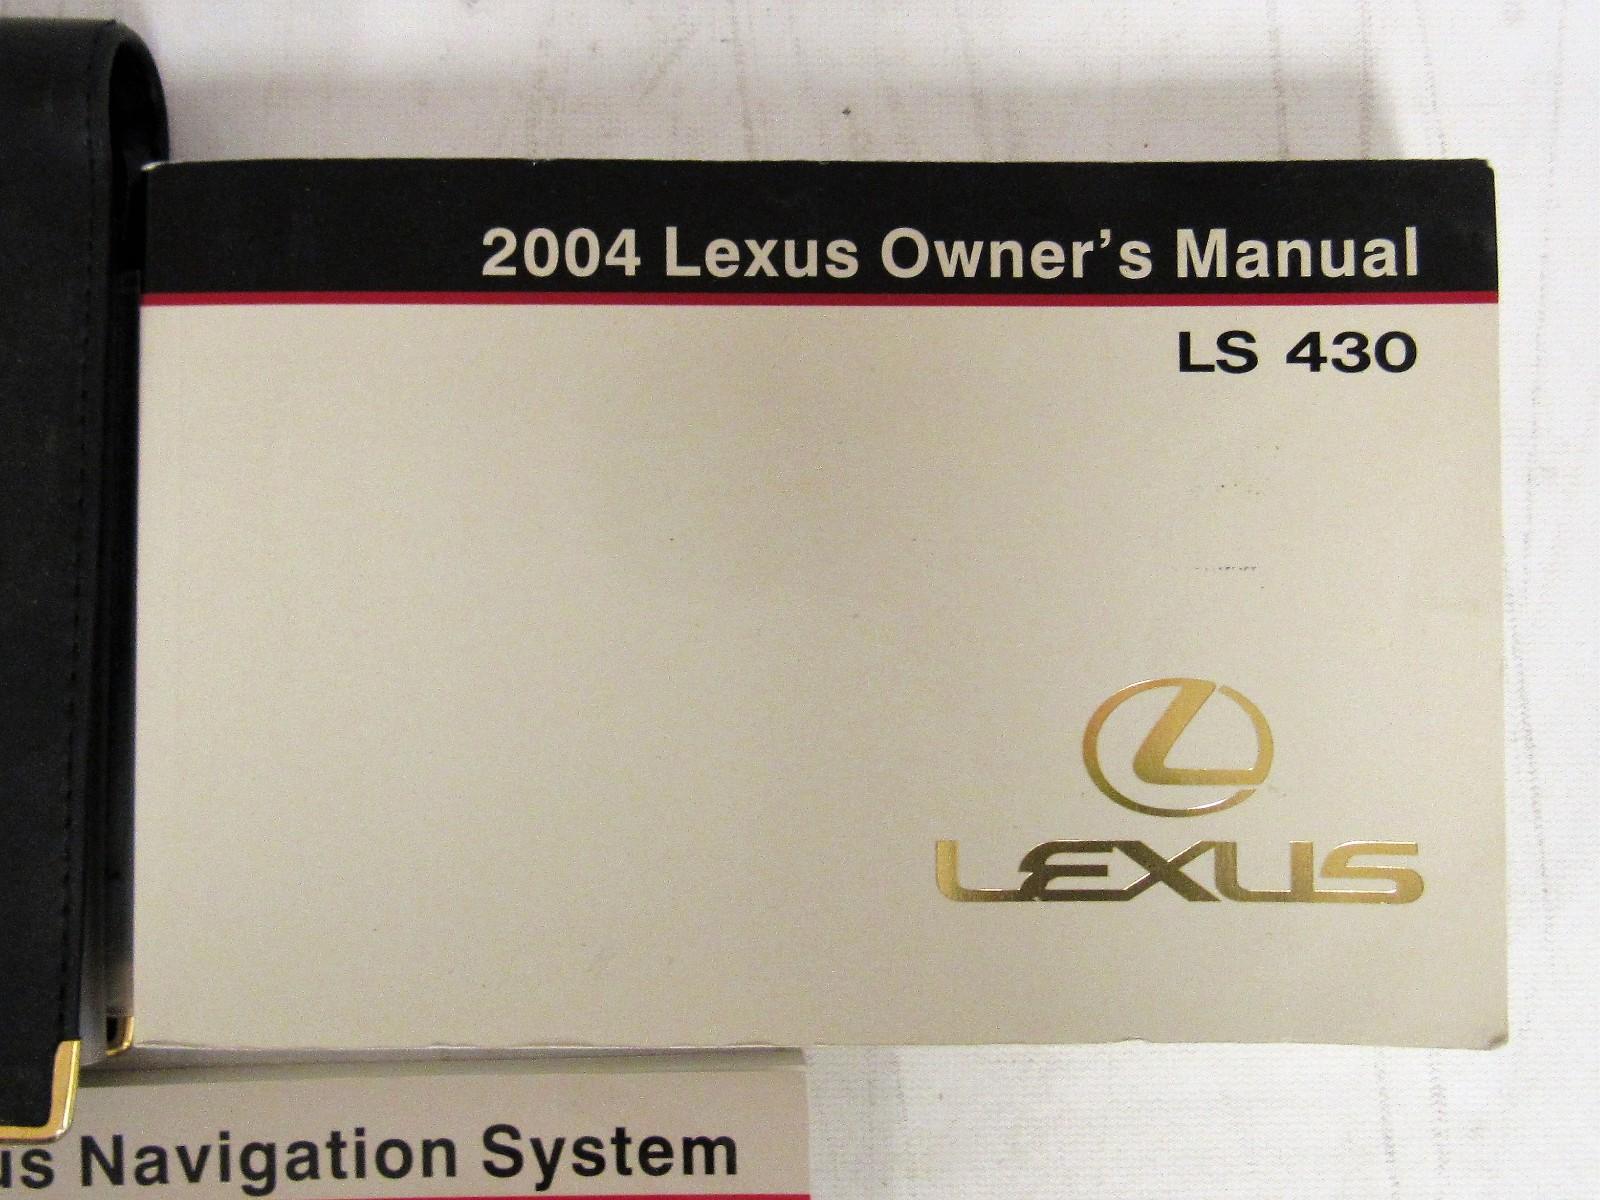 2004 lexus ls 430 owners manual book bashful yak rh bashfulyak com 2004 lexus ls430 owners manual pdf 2004 lexus gs300 owners manual